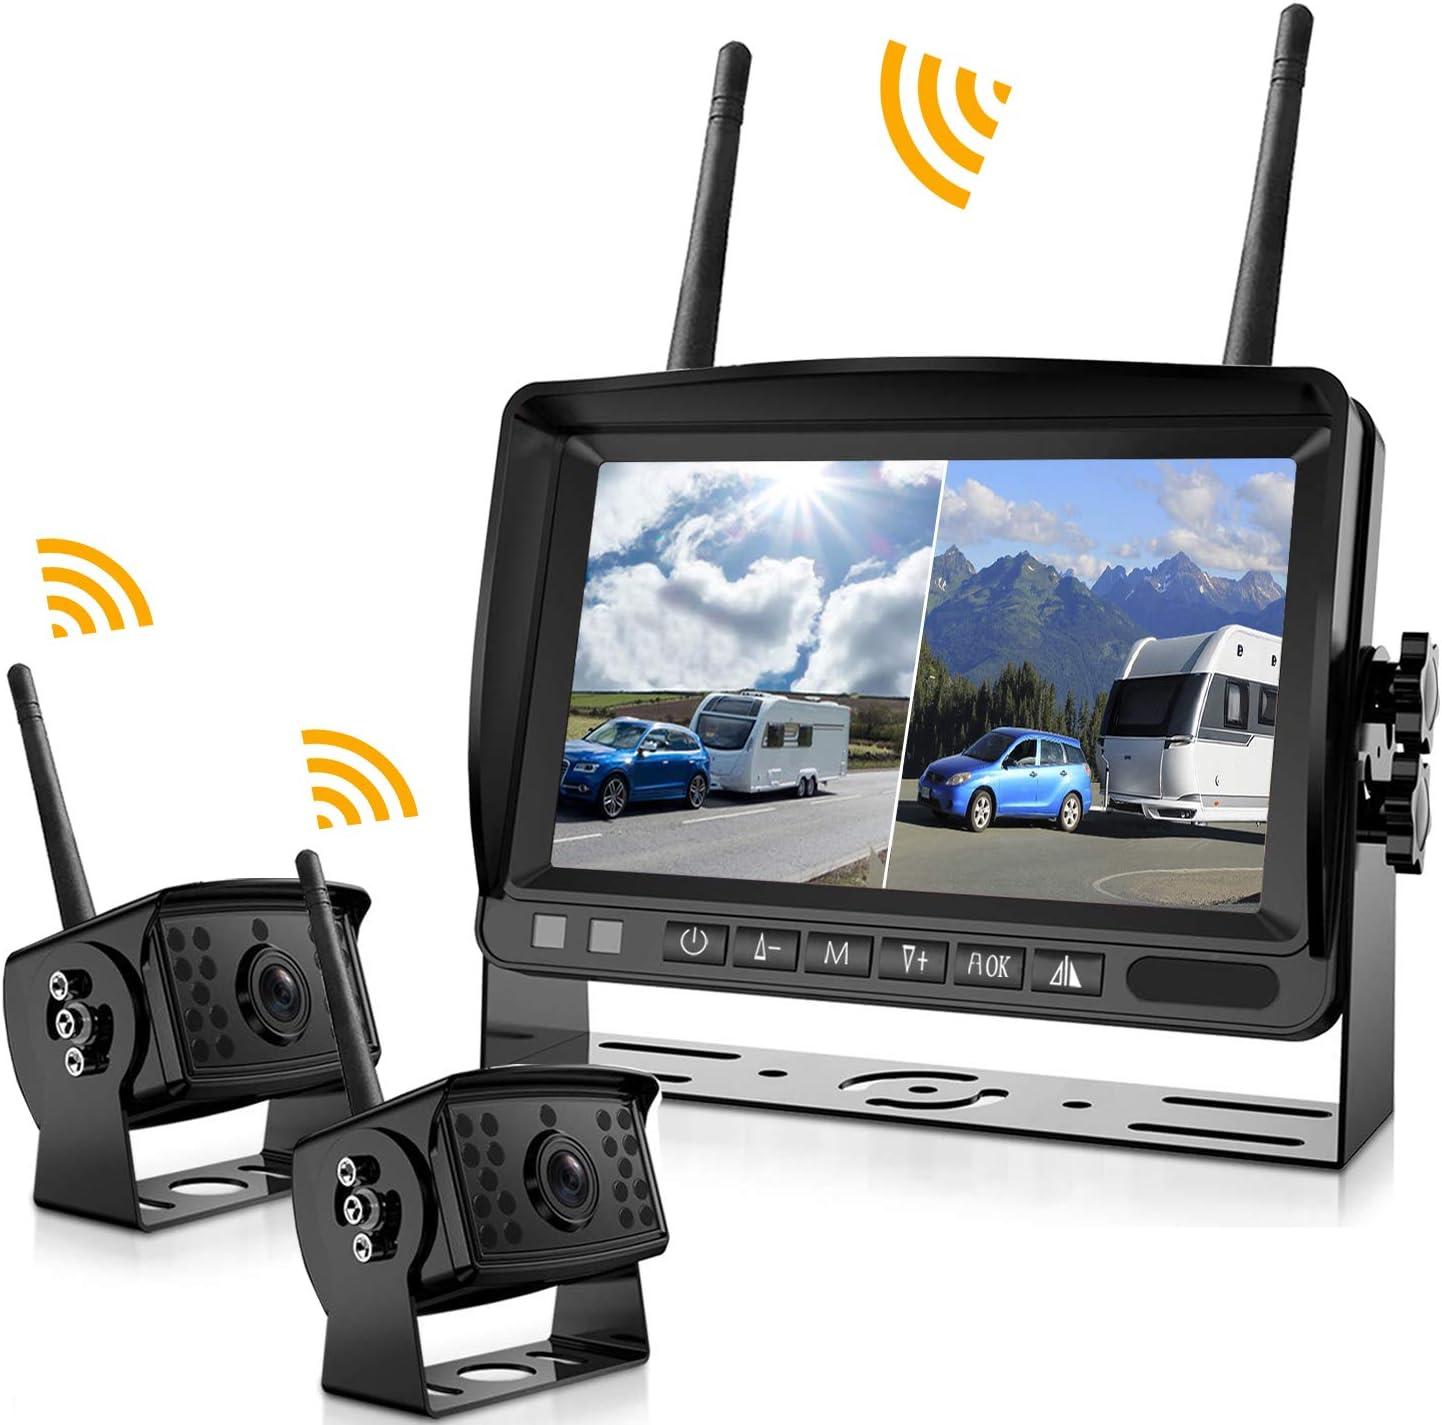 Wireless Backup New product type Camera - IP69 Waterproof HD Night W 1080P Ranking TOP14 Vision